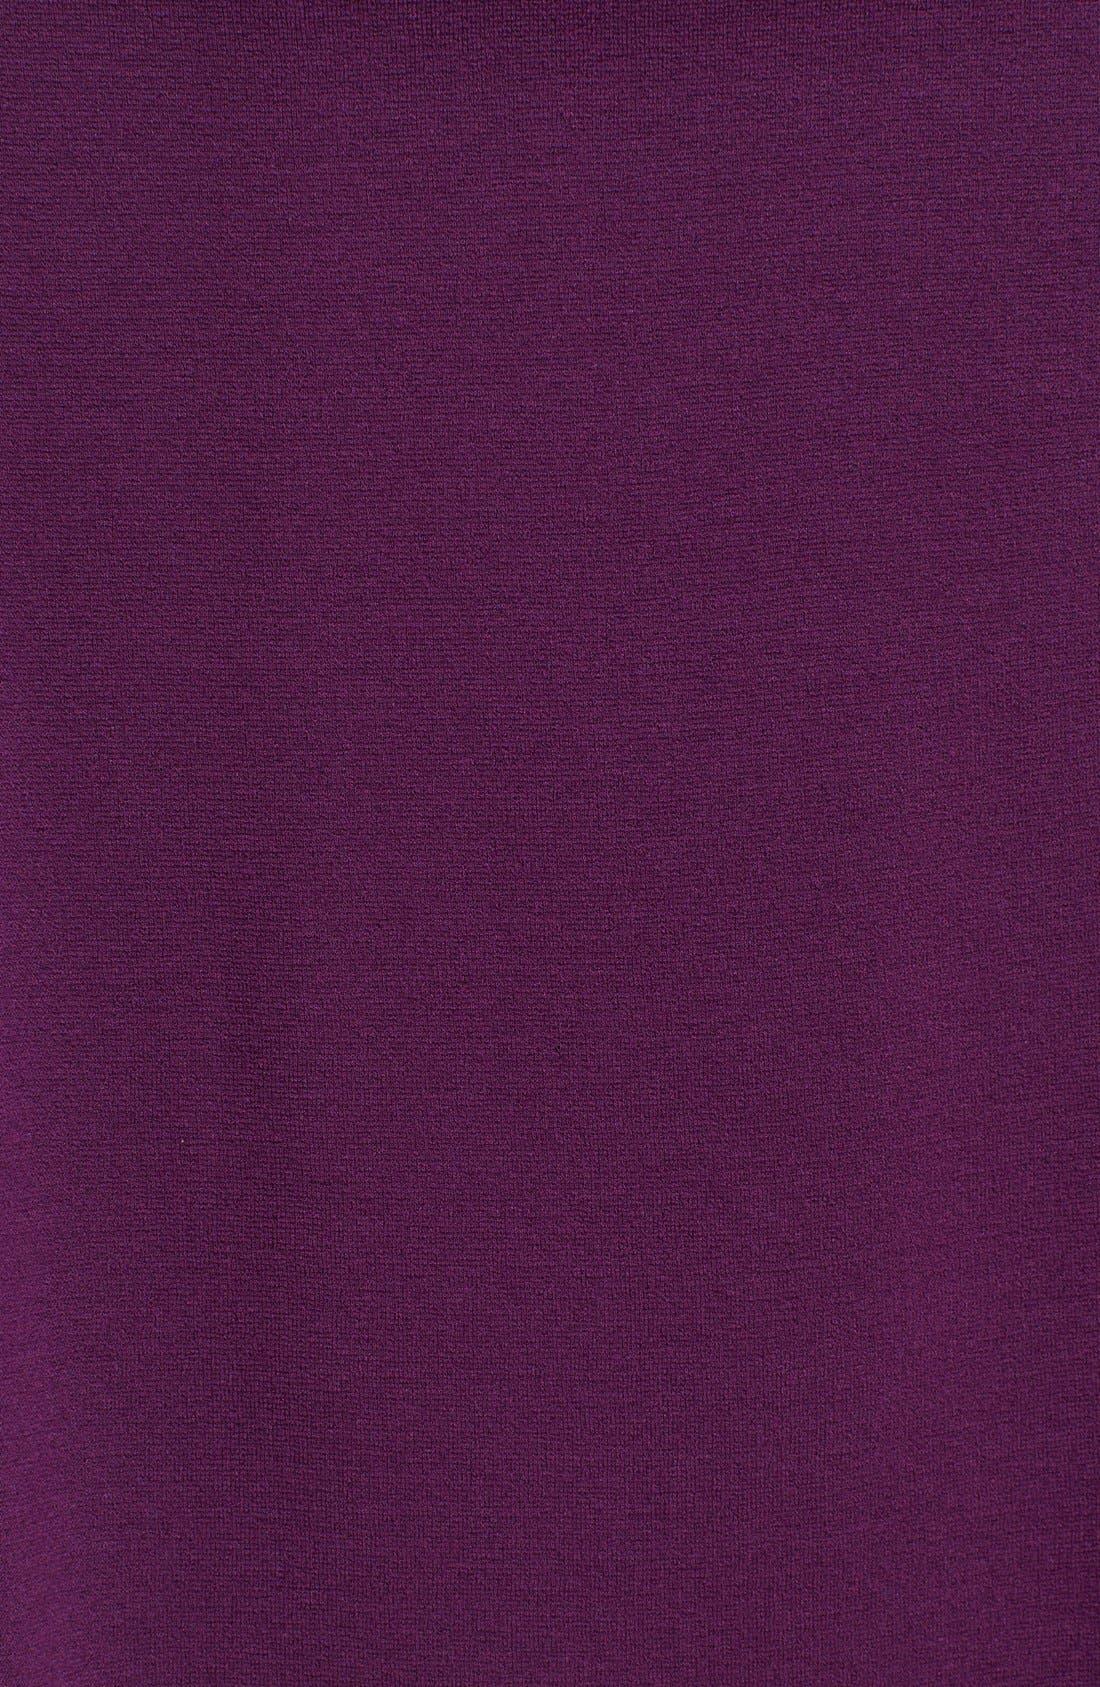 Alternate Image 3  - Trina Turk Ponte Knit A-Line Dress